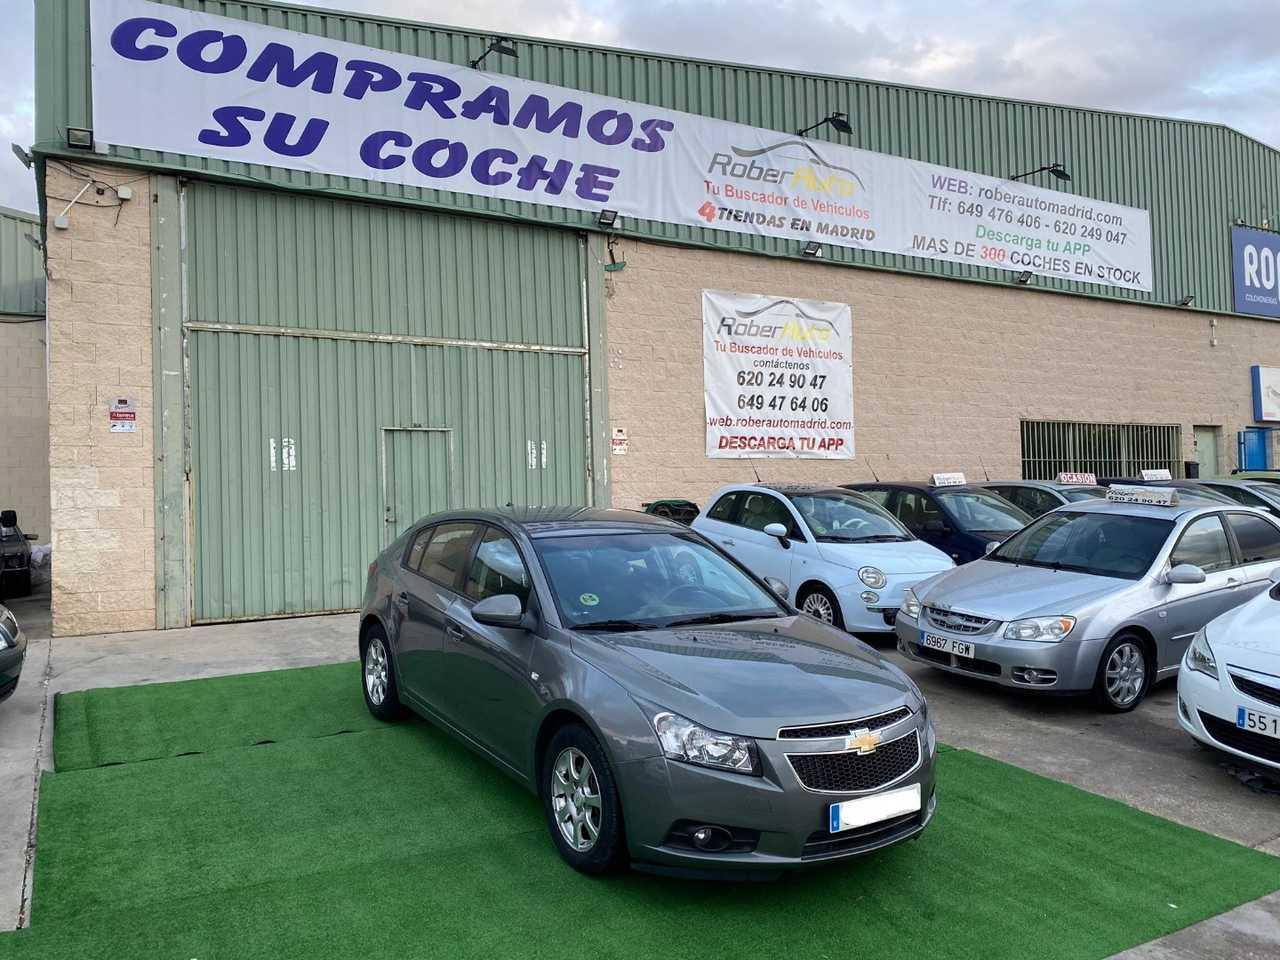 Chevrolet cruze 5 p 2.0 vcti   - Foto 1